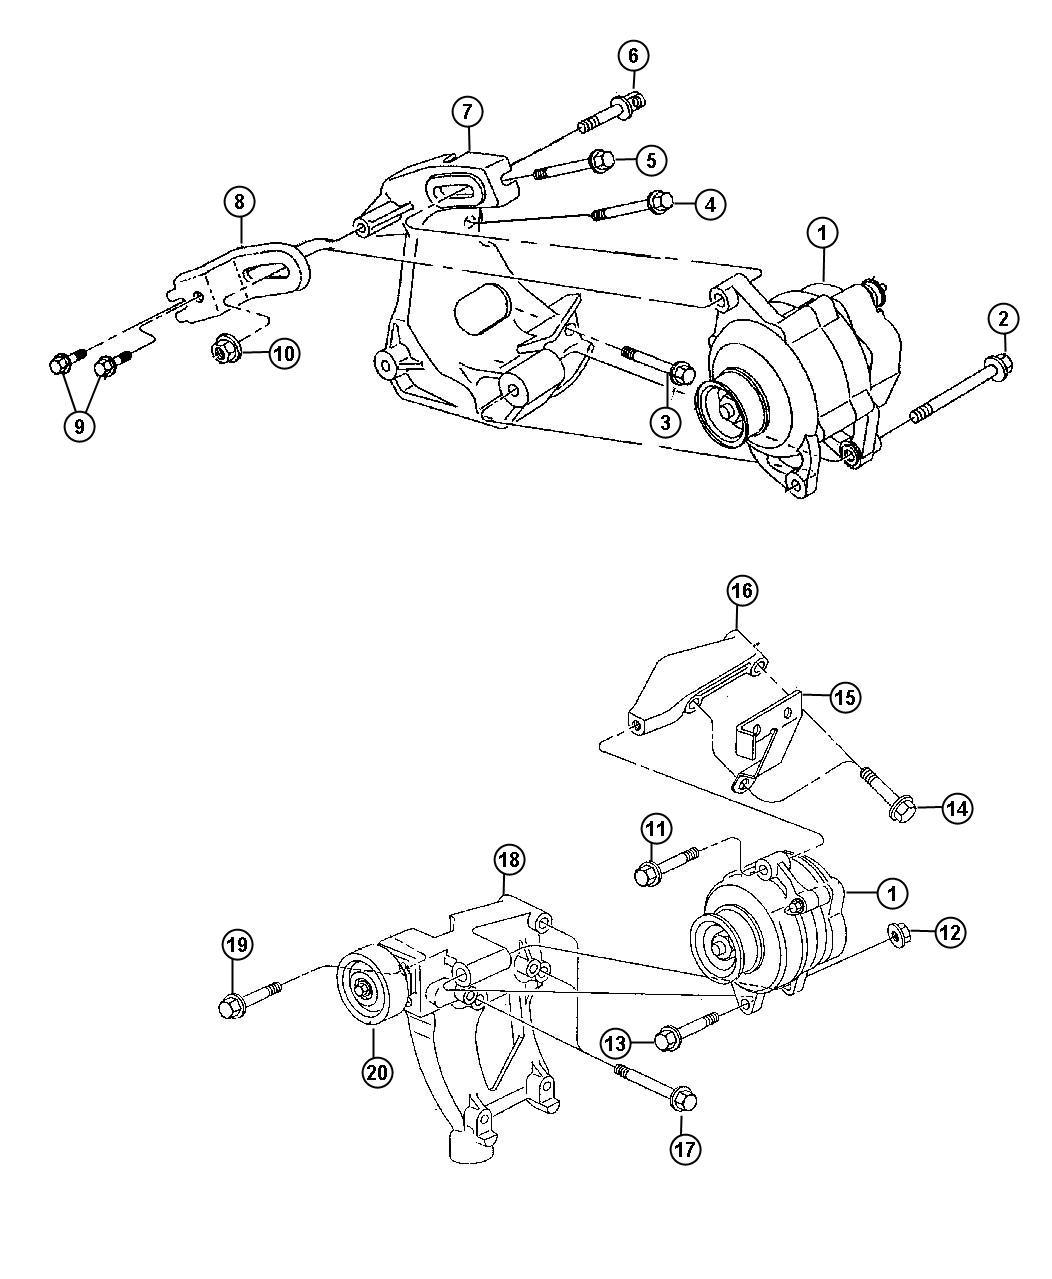 Chrysler Sebring Pulley Diagram